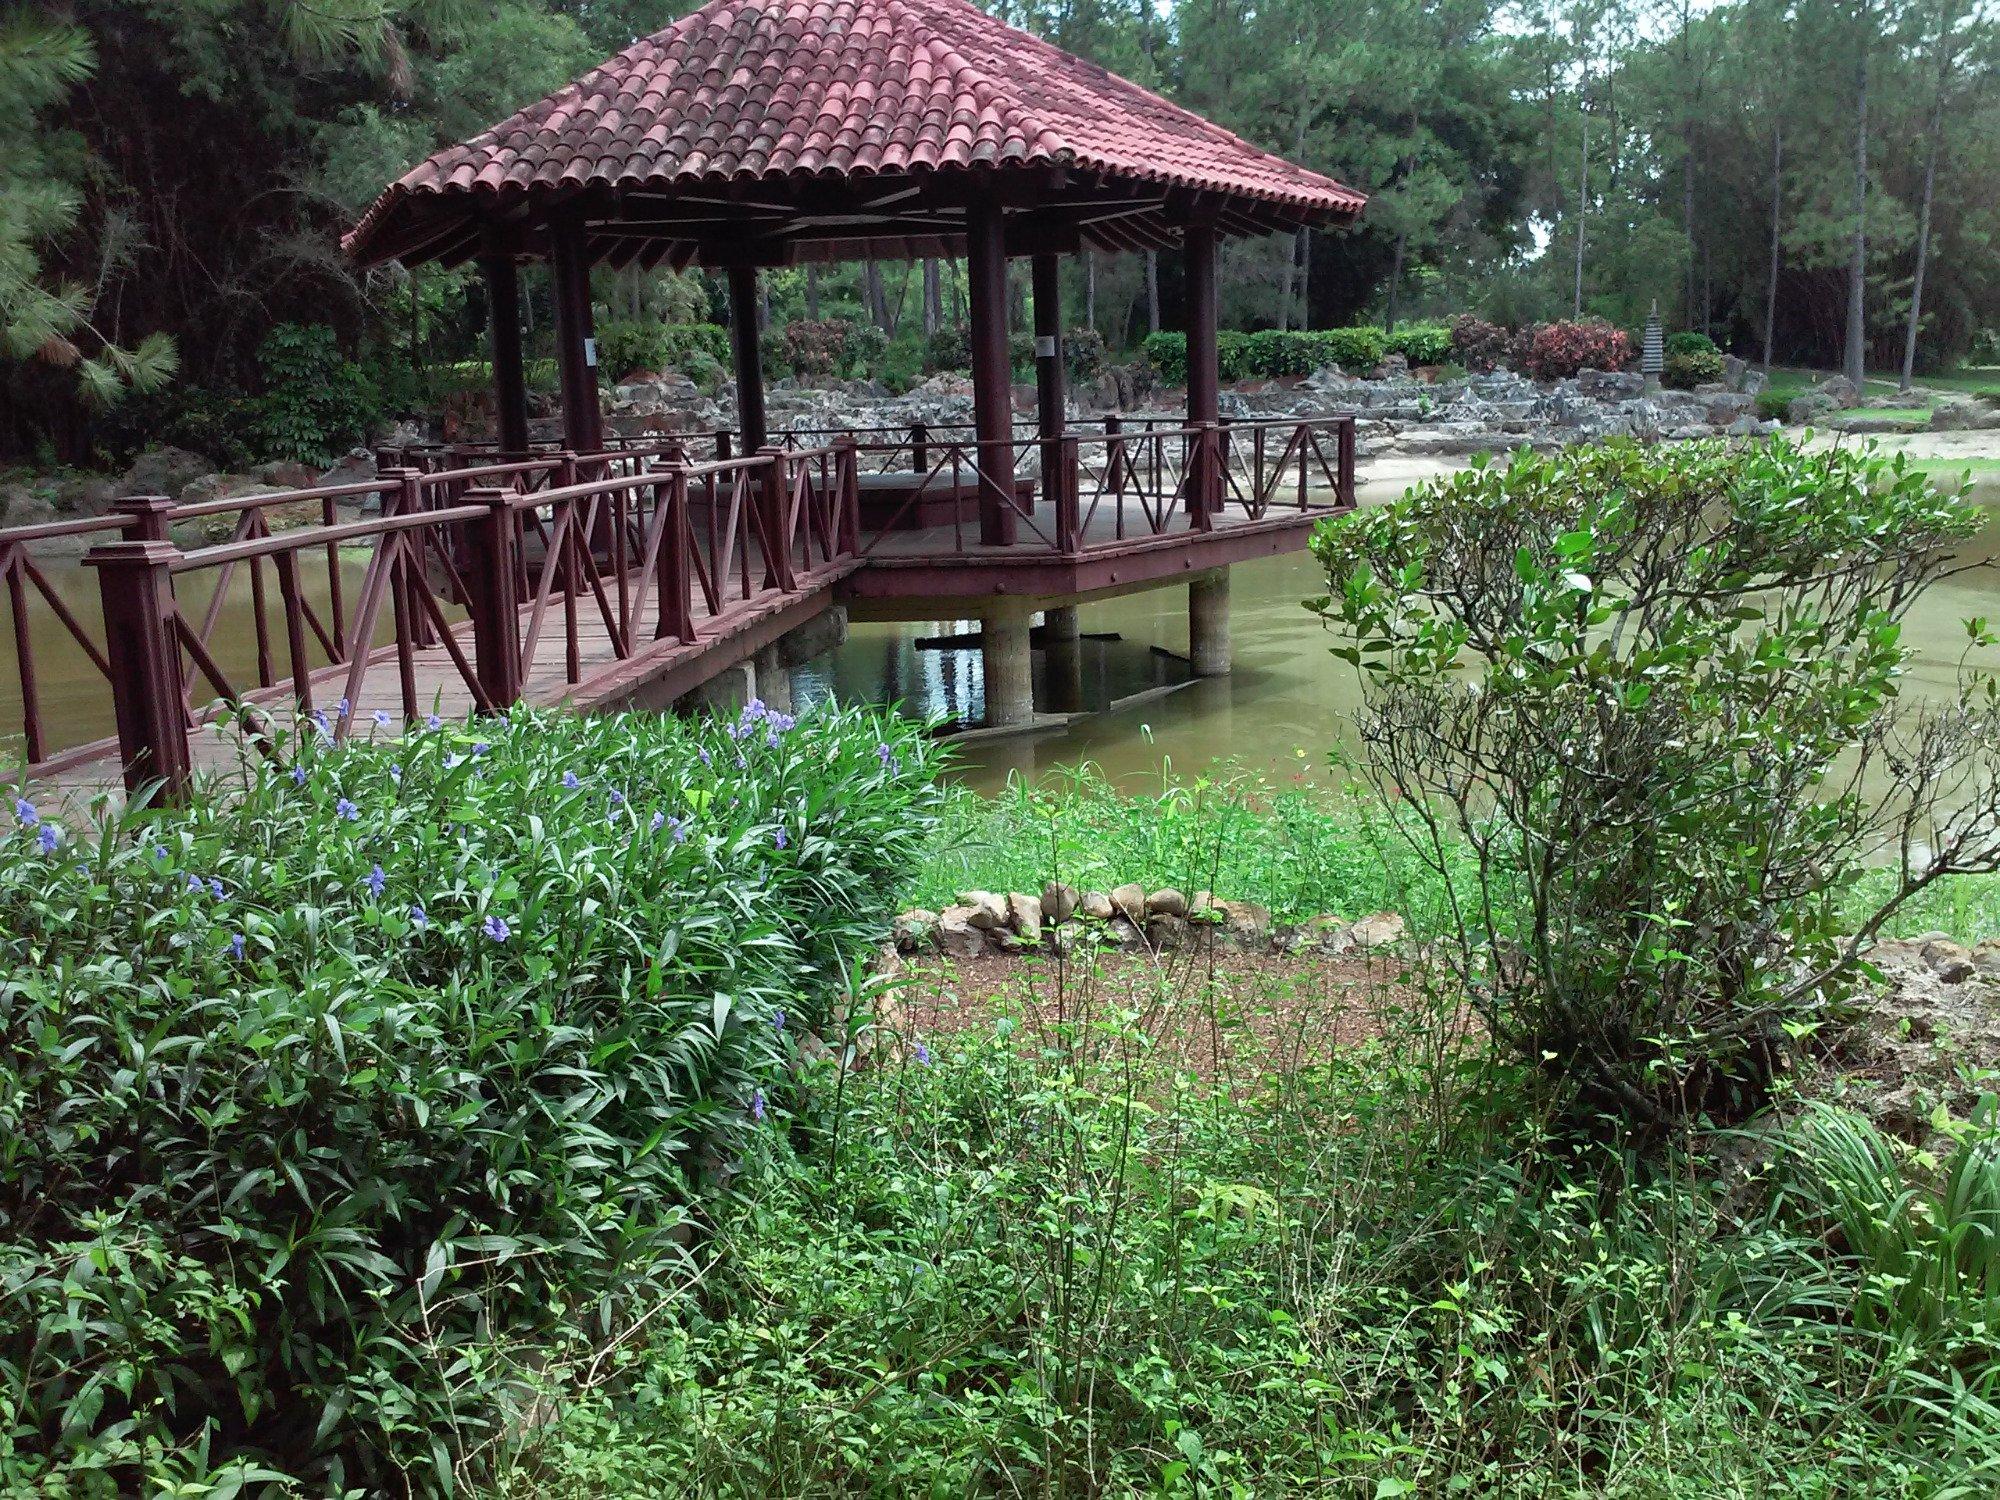 Jardin botanico nacional havana cuba top tips before for Jardin 81